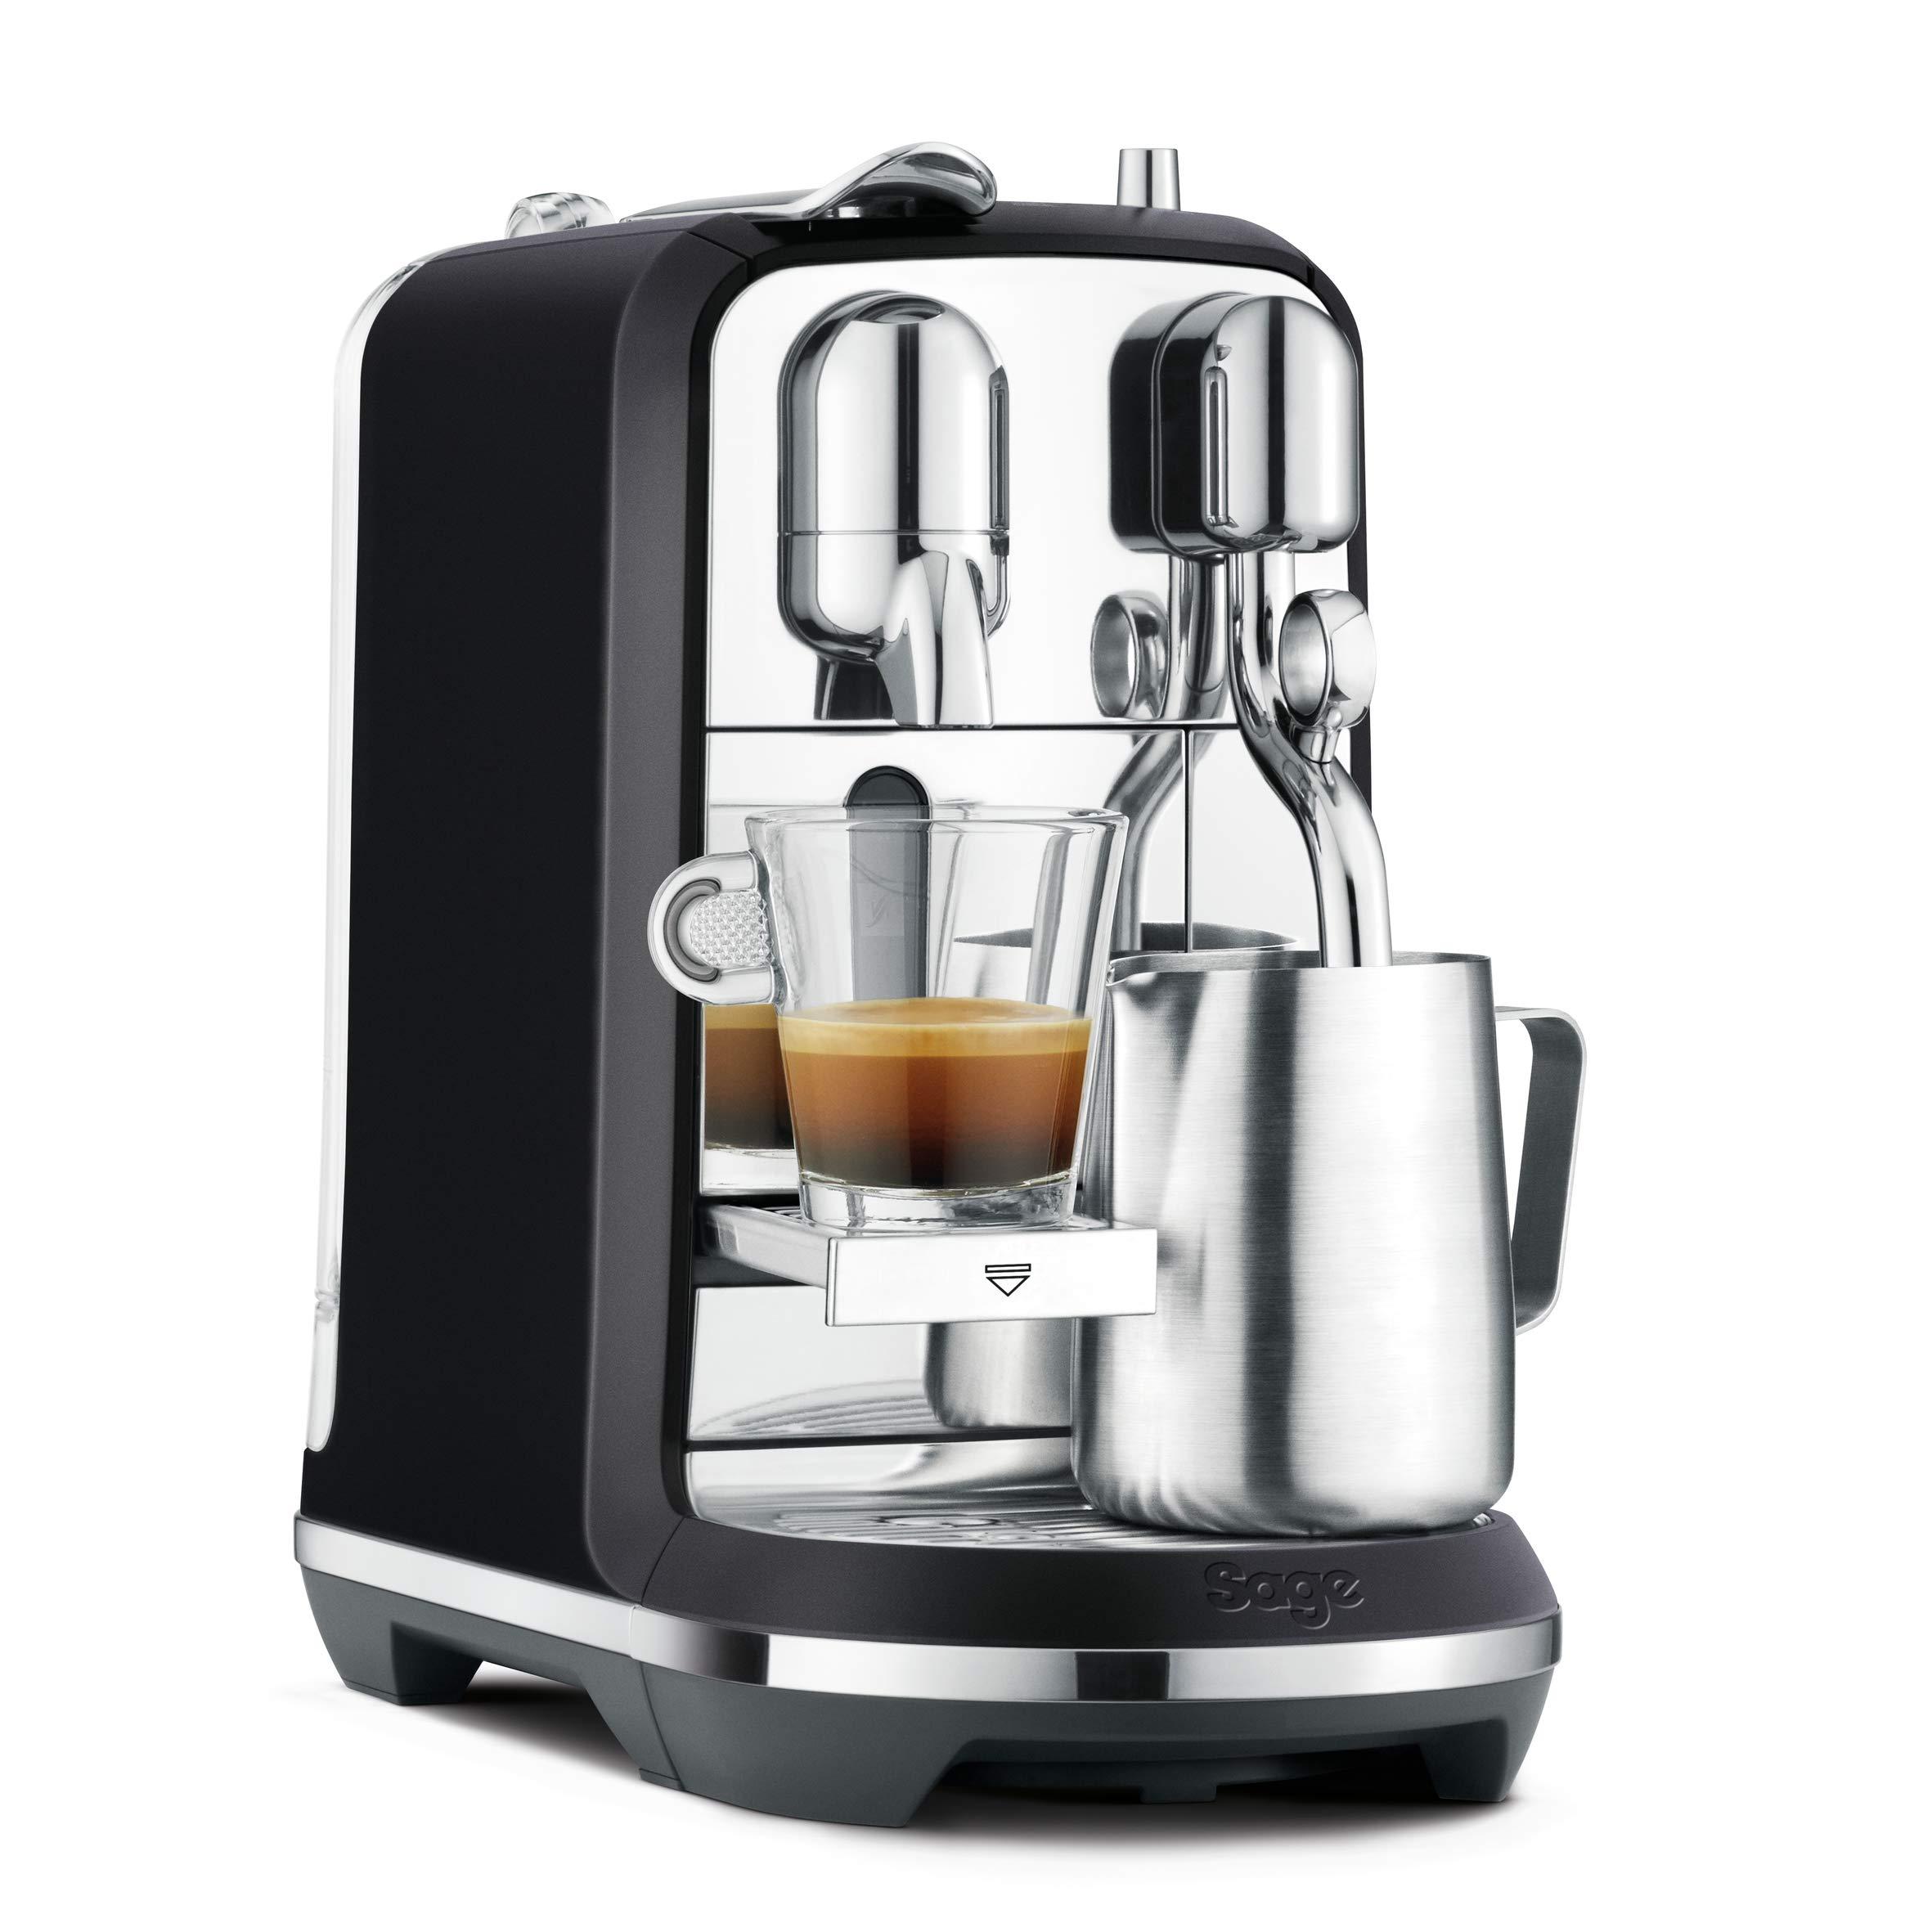 Sage Appliances sne800btr The Creatable ISTA Plus Cafetera ...